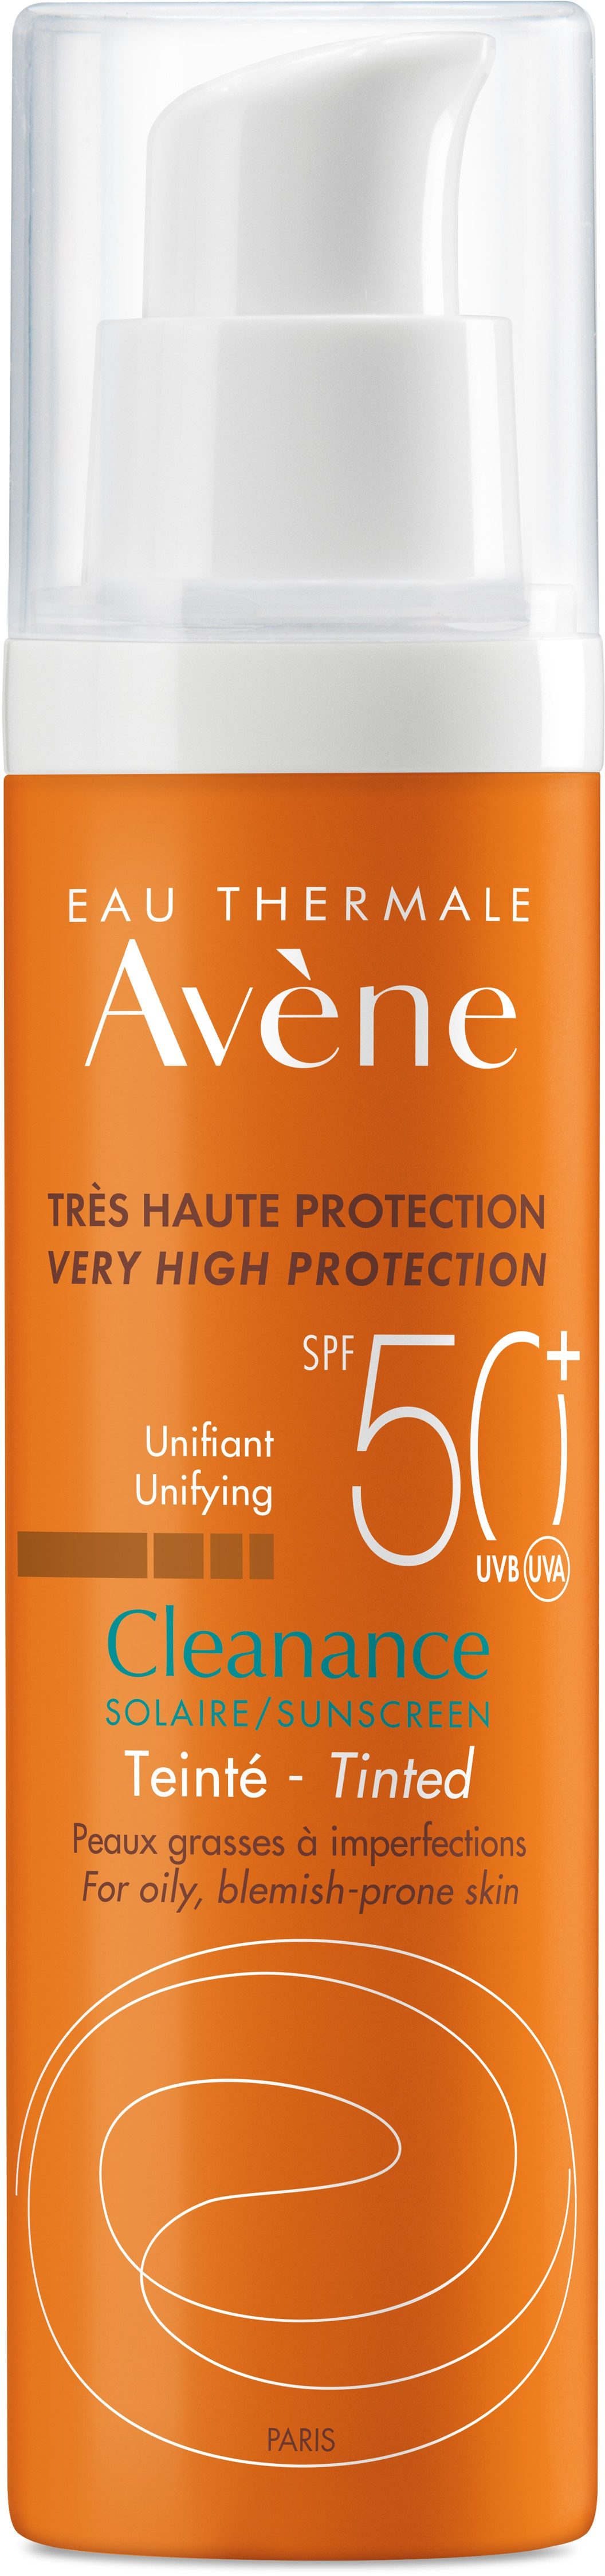 Avene Eau Thermale Avène Cleanance Tinted Spf 50